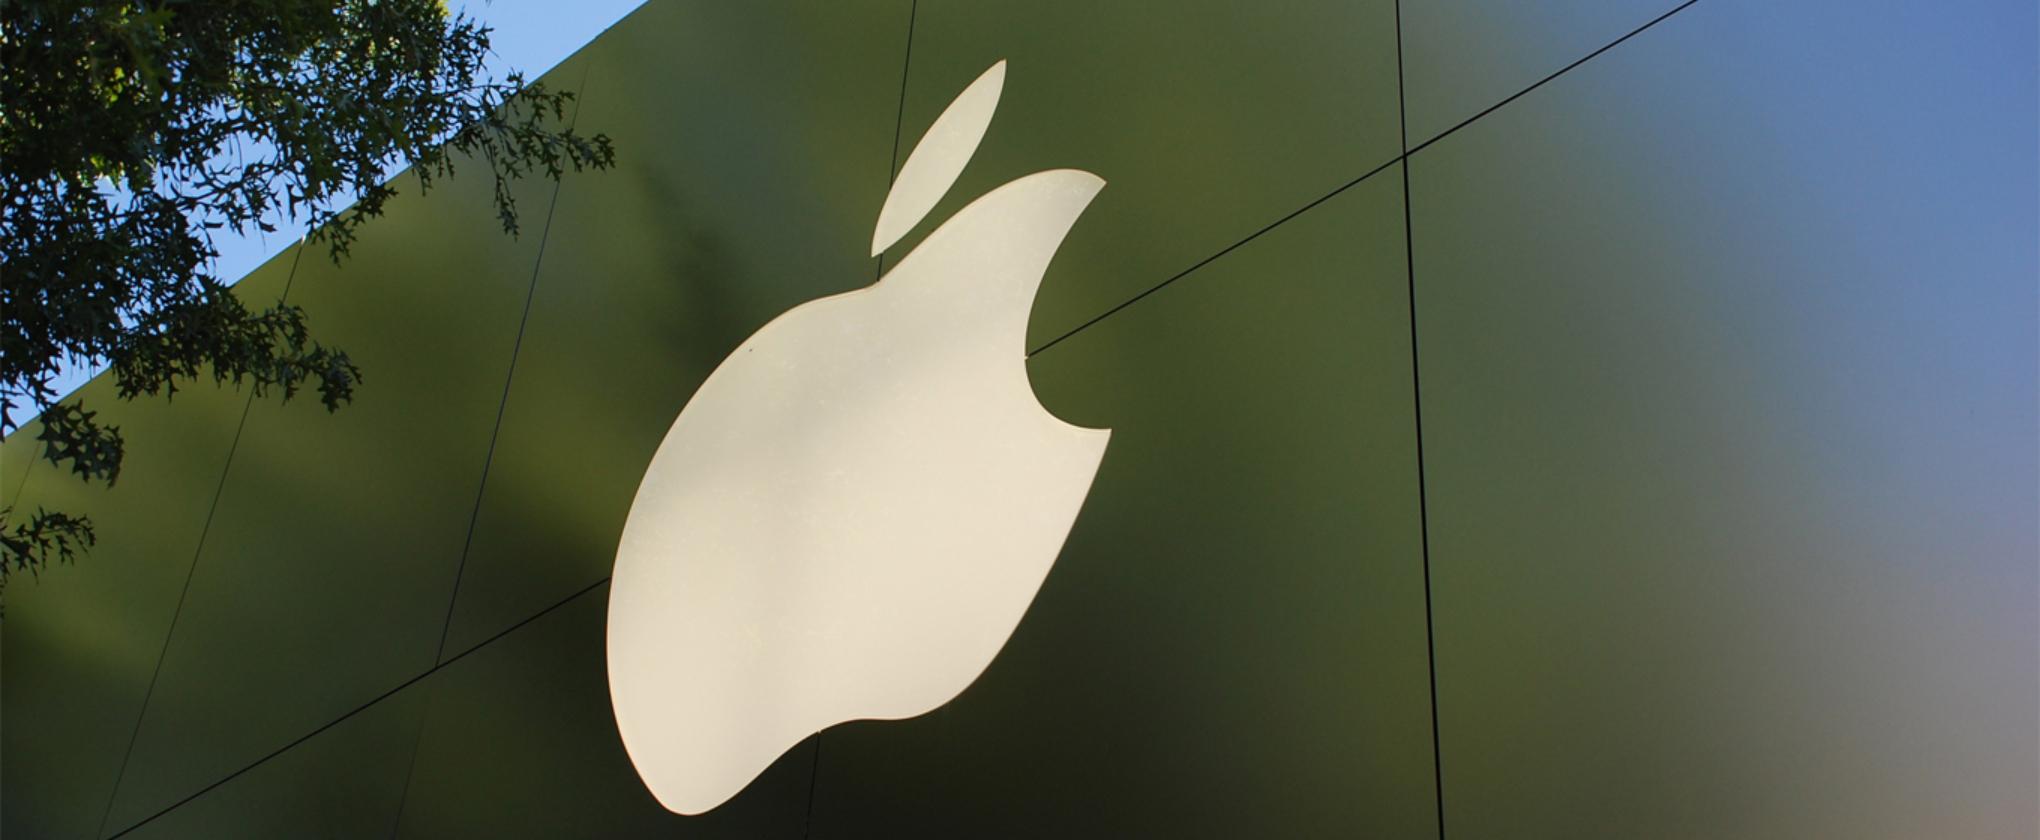 Apple Ordered to Repay Irish Tax of €13 Billion